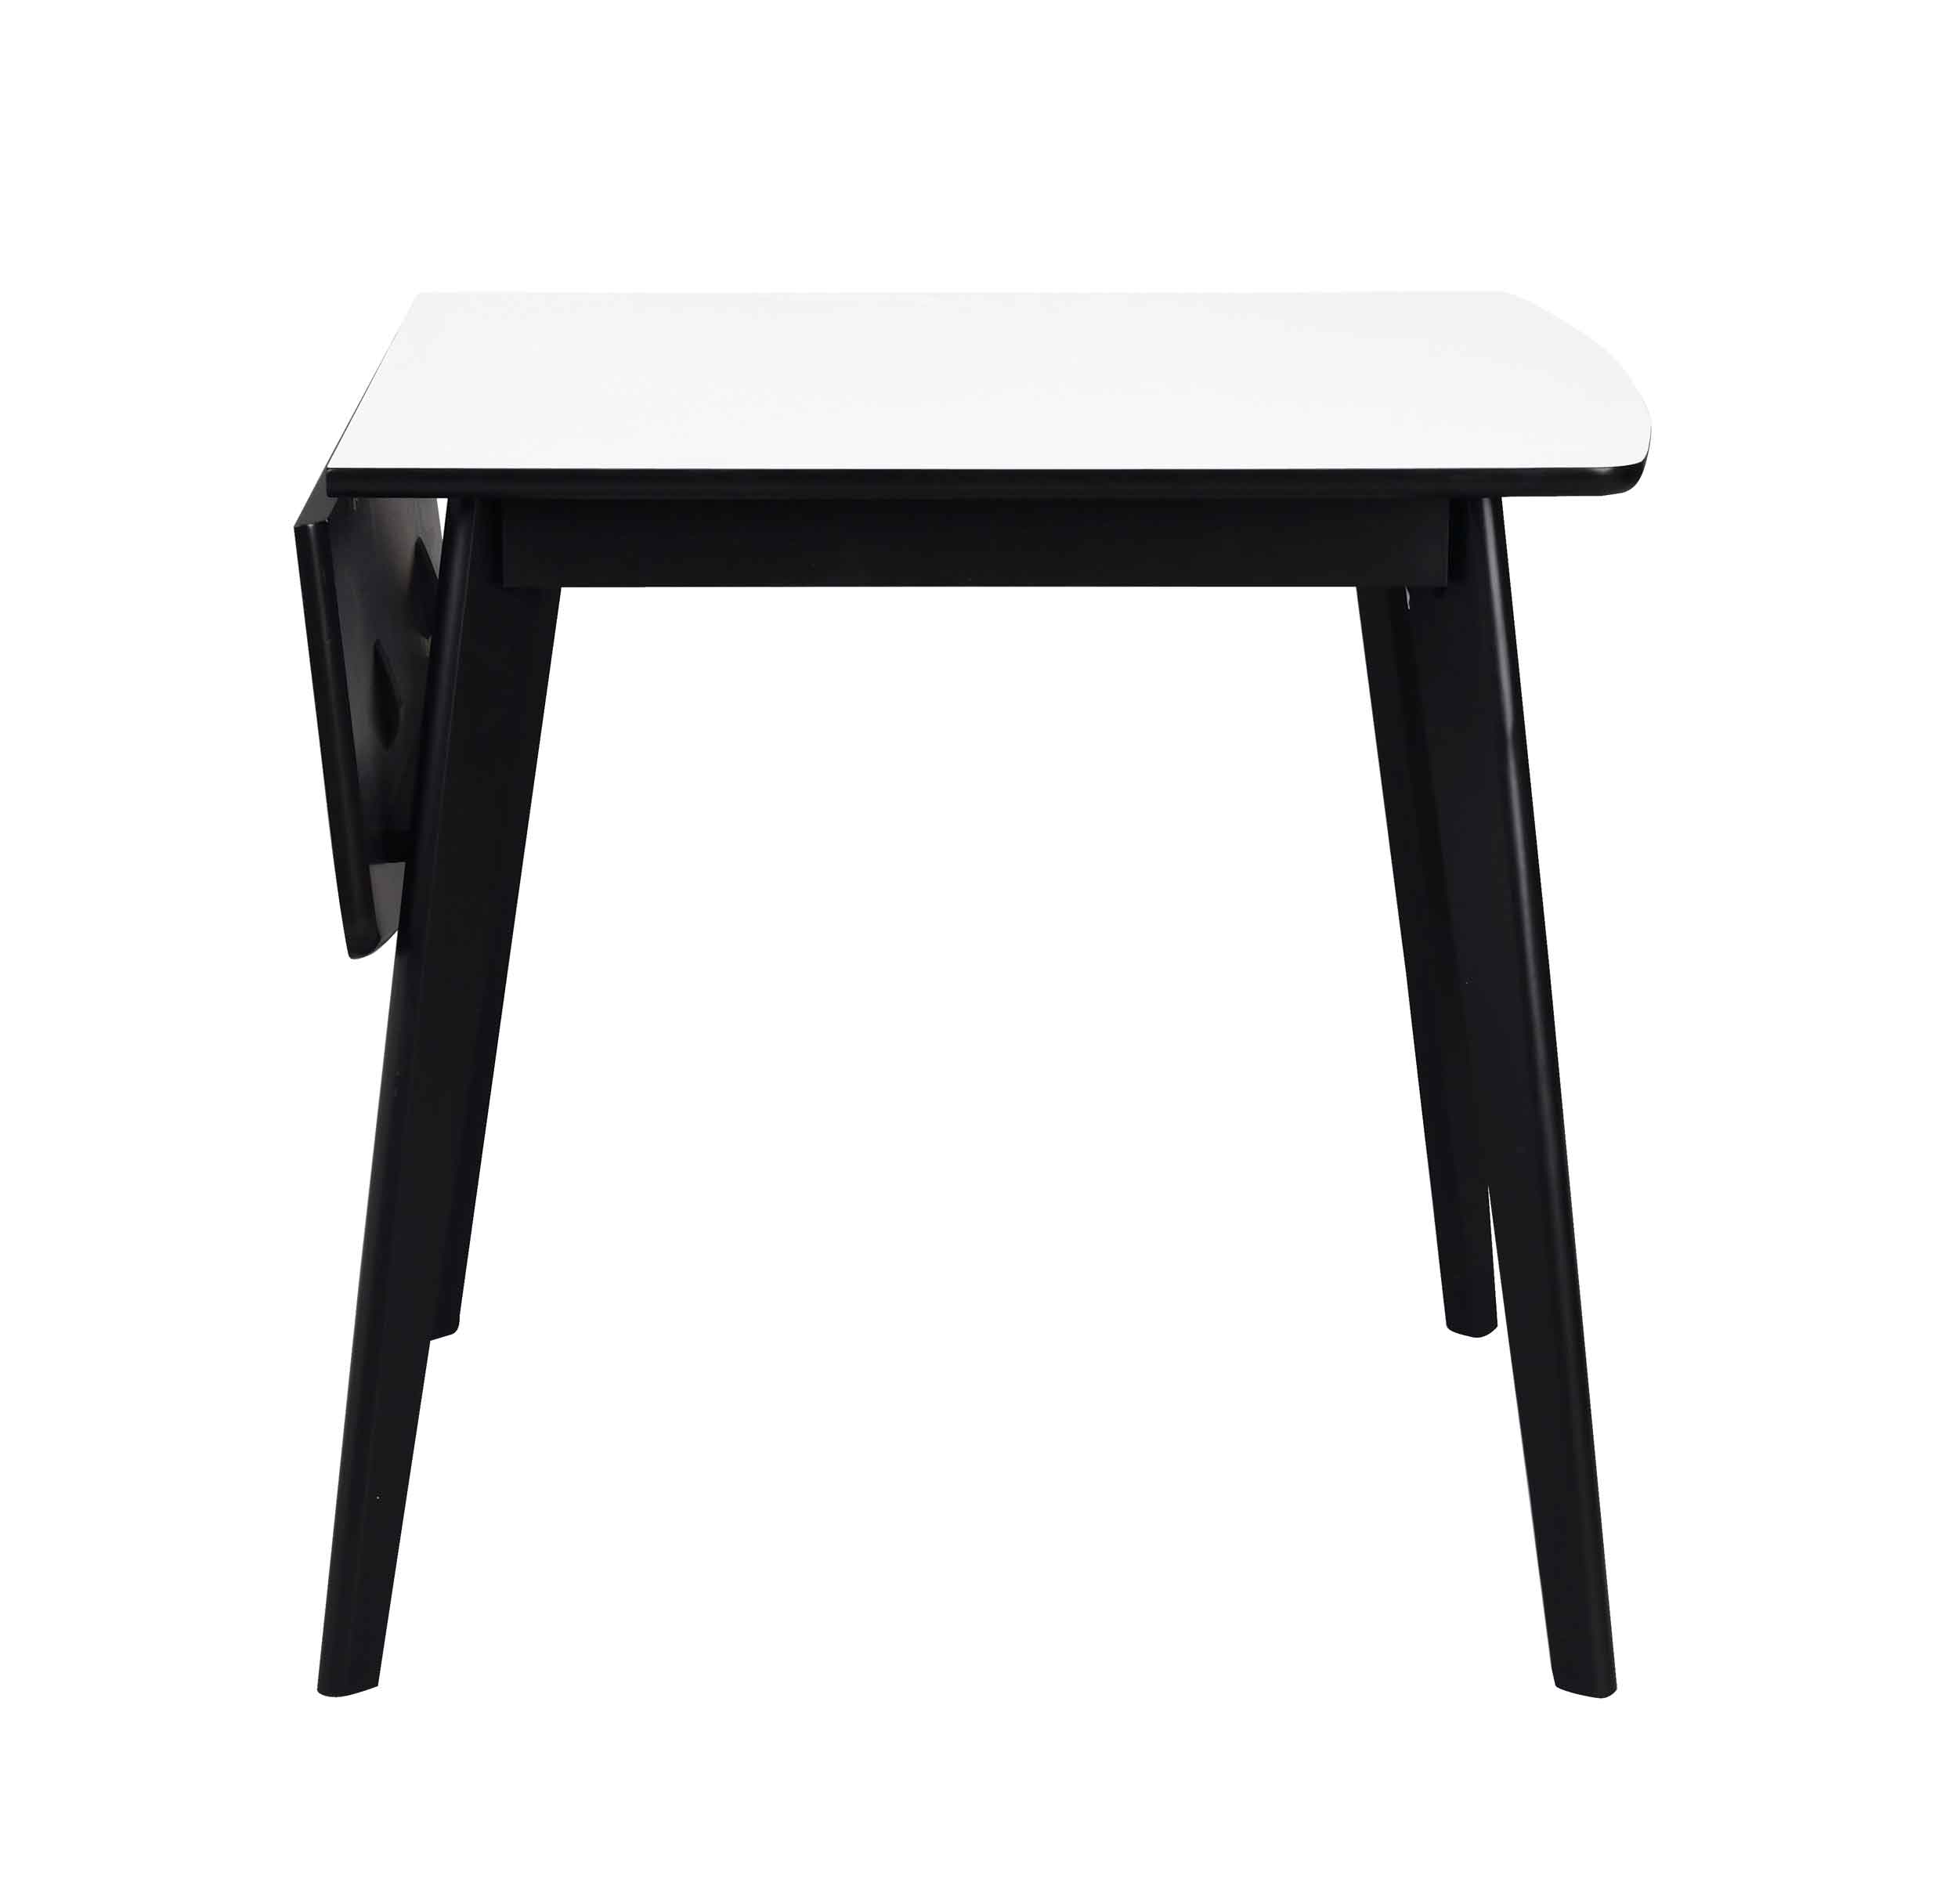 Olivia klapbord - Hvid bordplade, sortlakeret egetræsben, 80+30